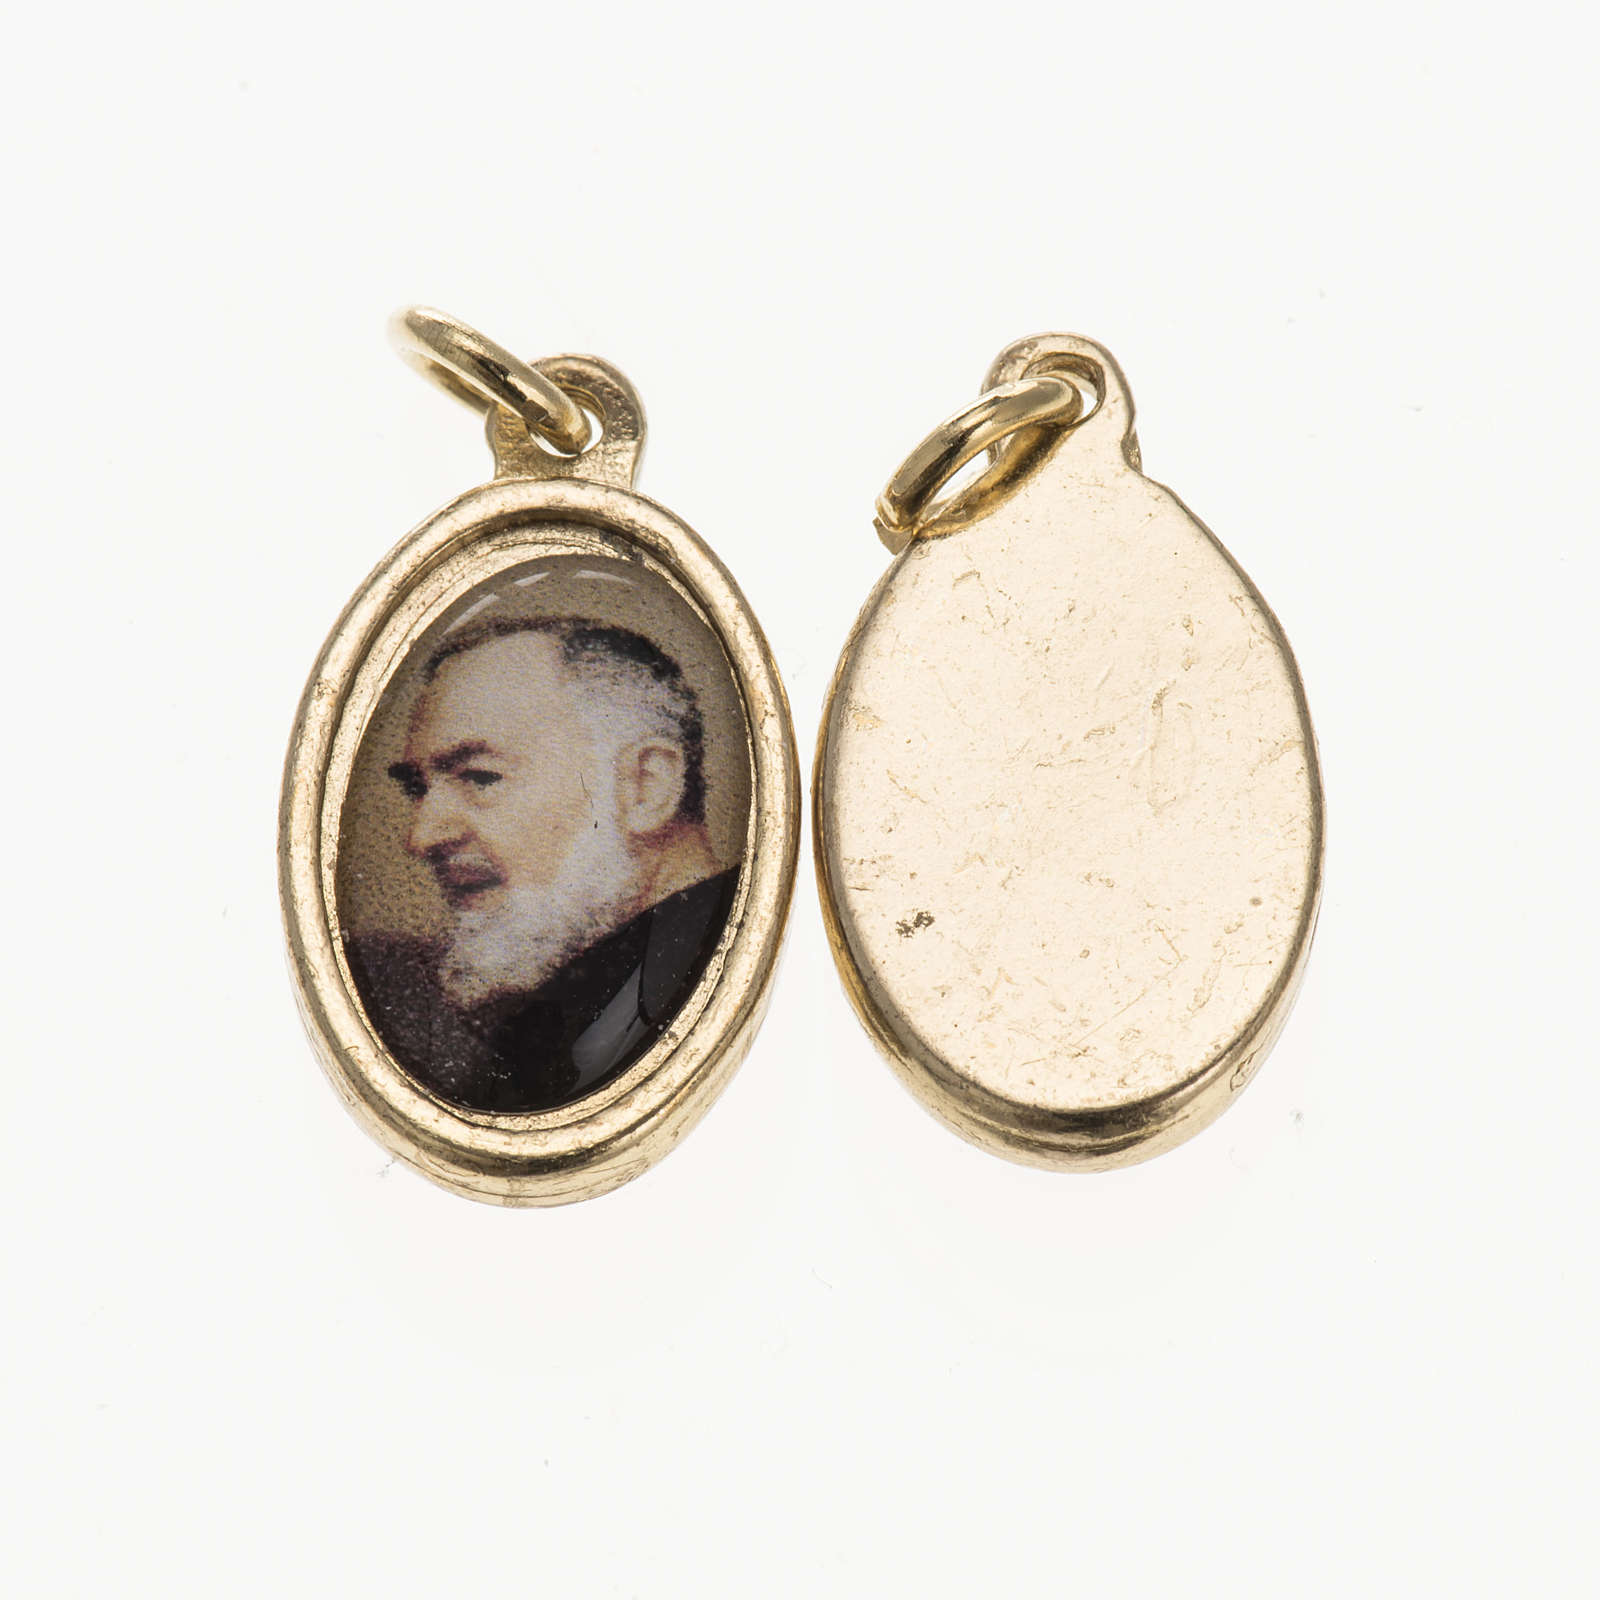 Medaglia Padre Pio da Pietrelcina metallo dorato resina 1,5x1 cm 4